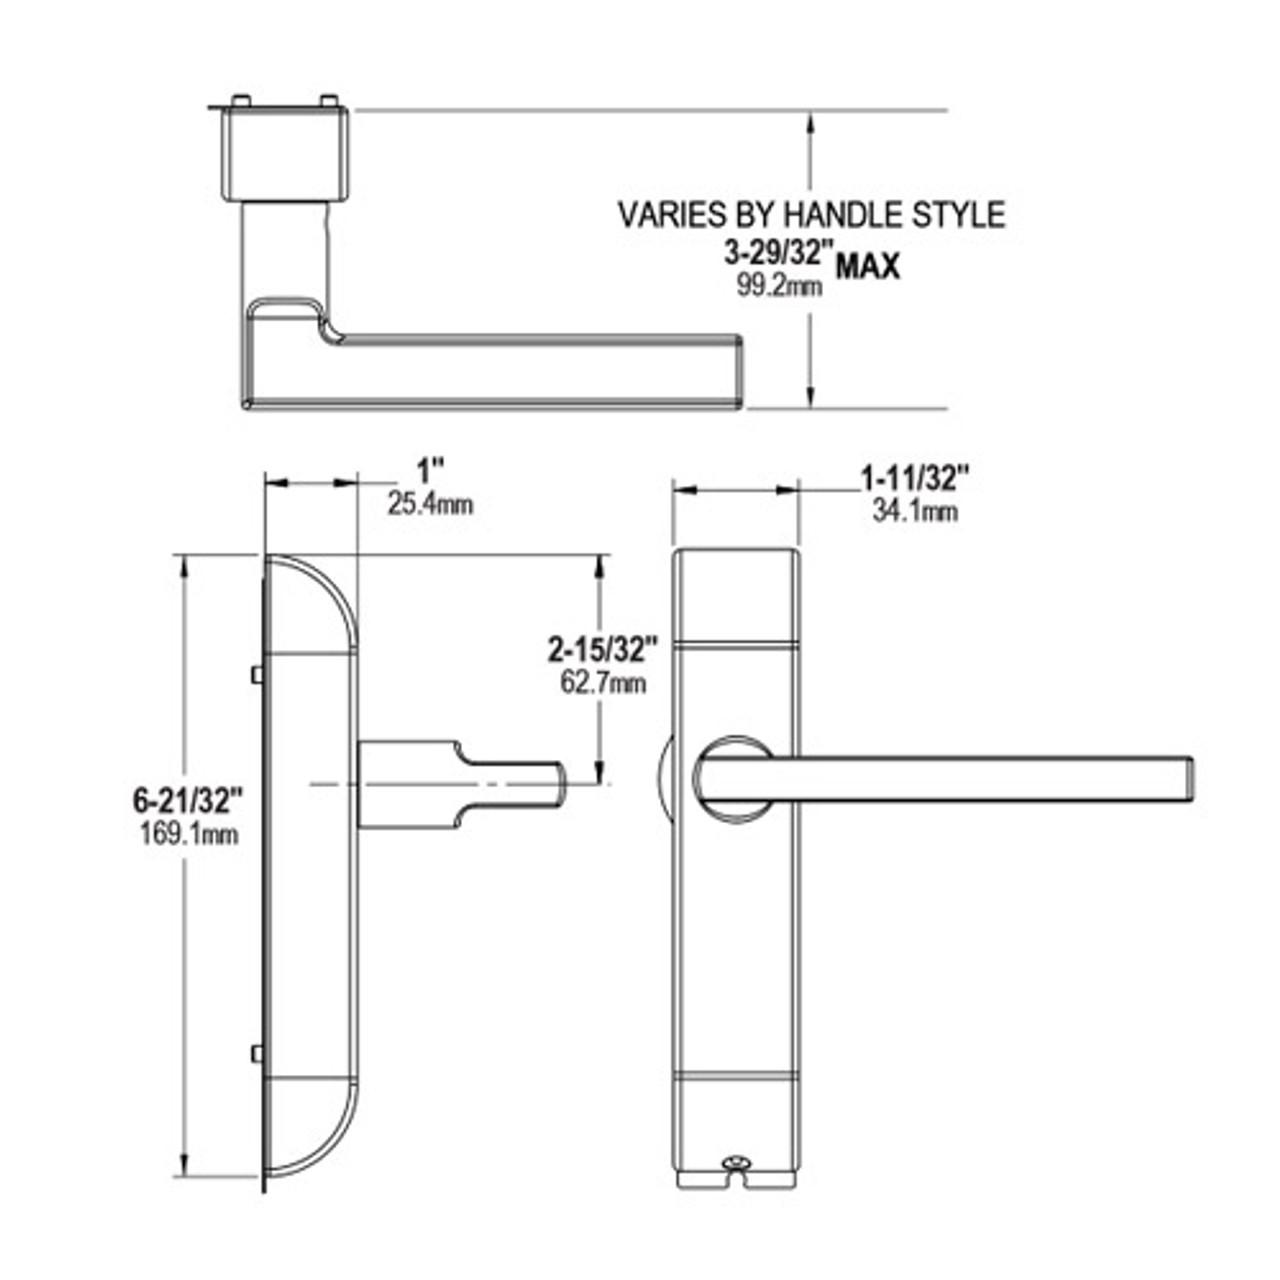 4600M-MD-621-US32 Adams Rite MD Designer handle Dimensional View